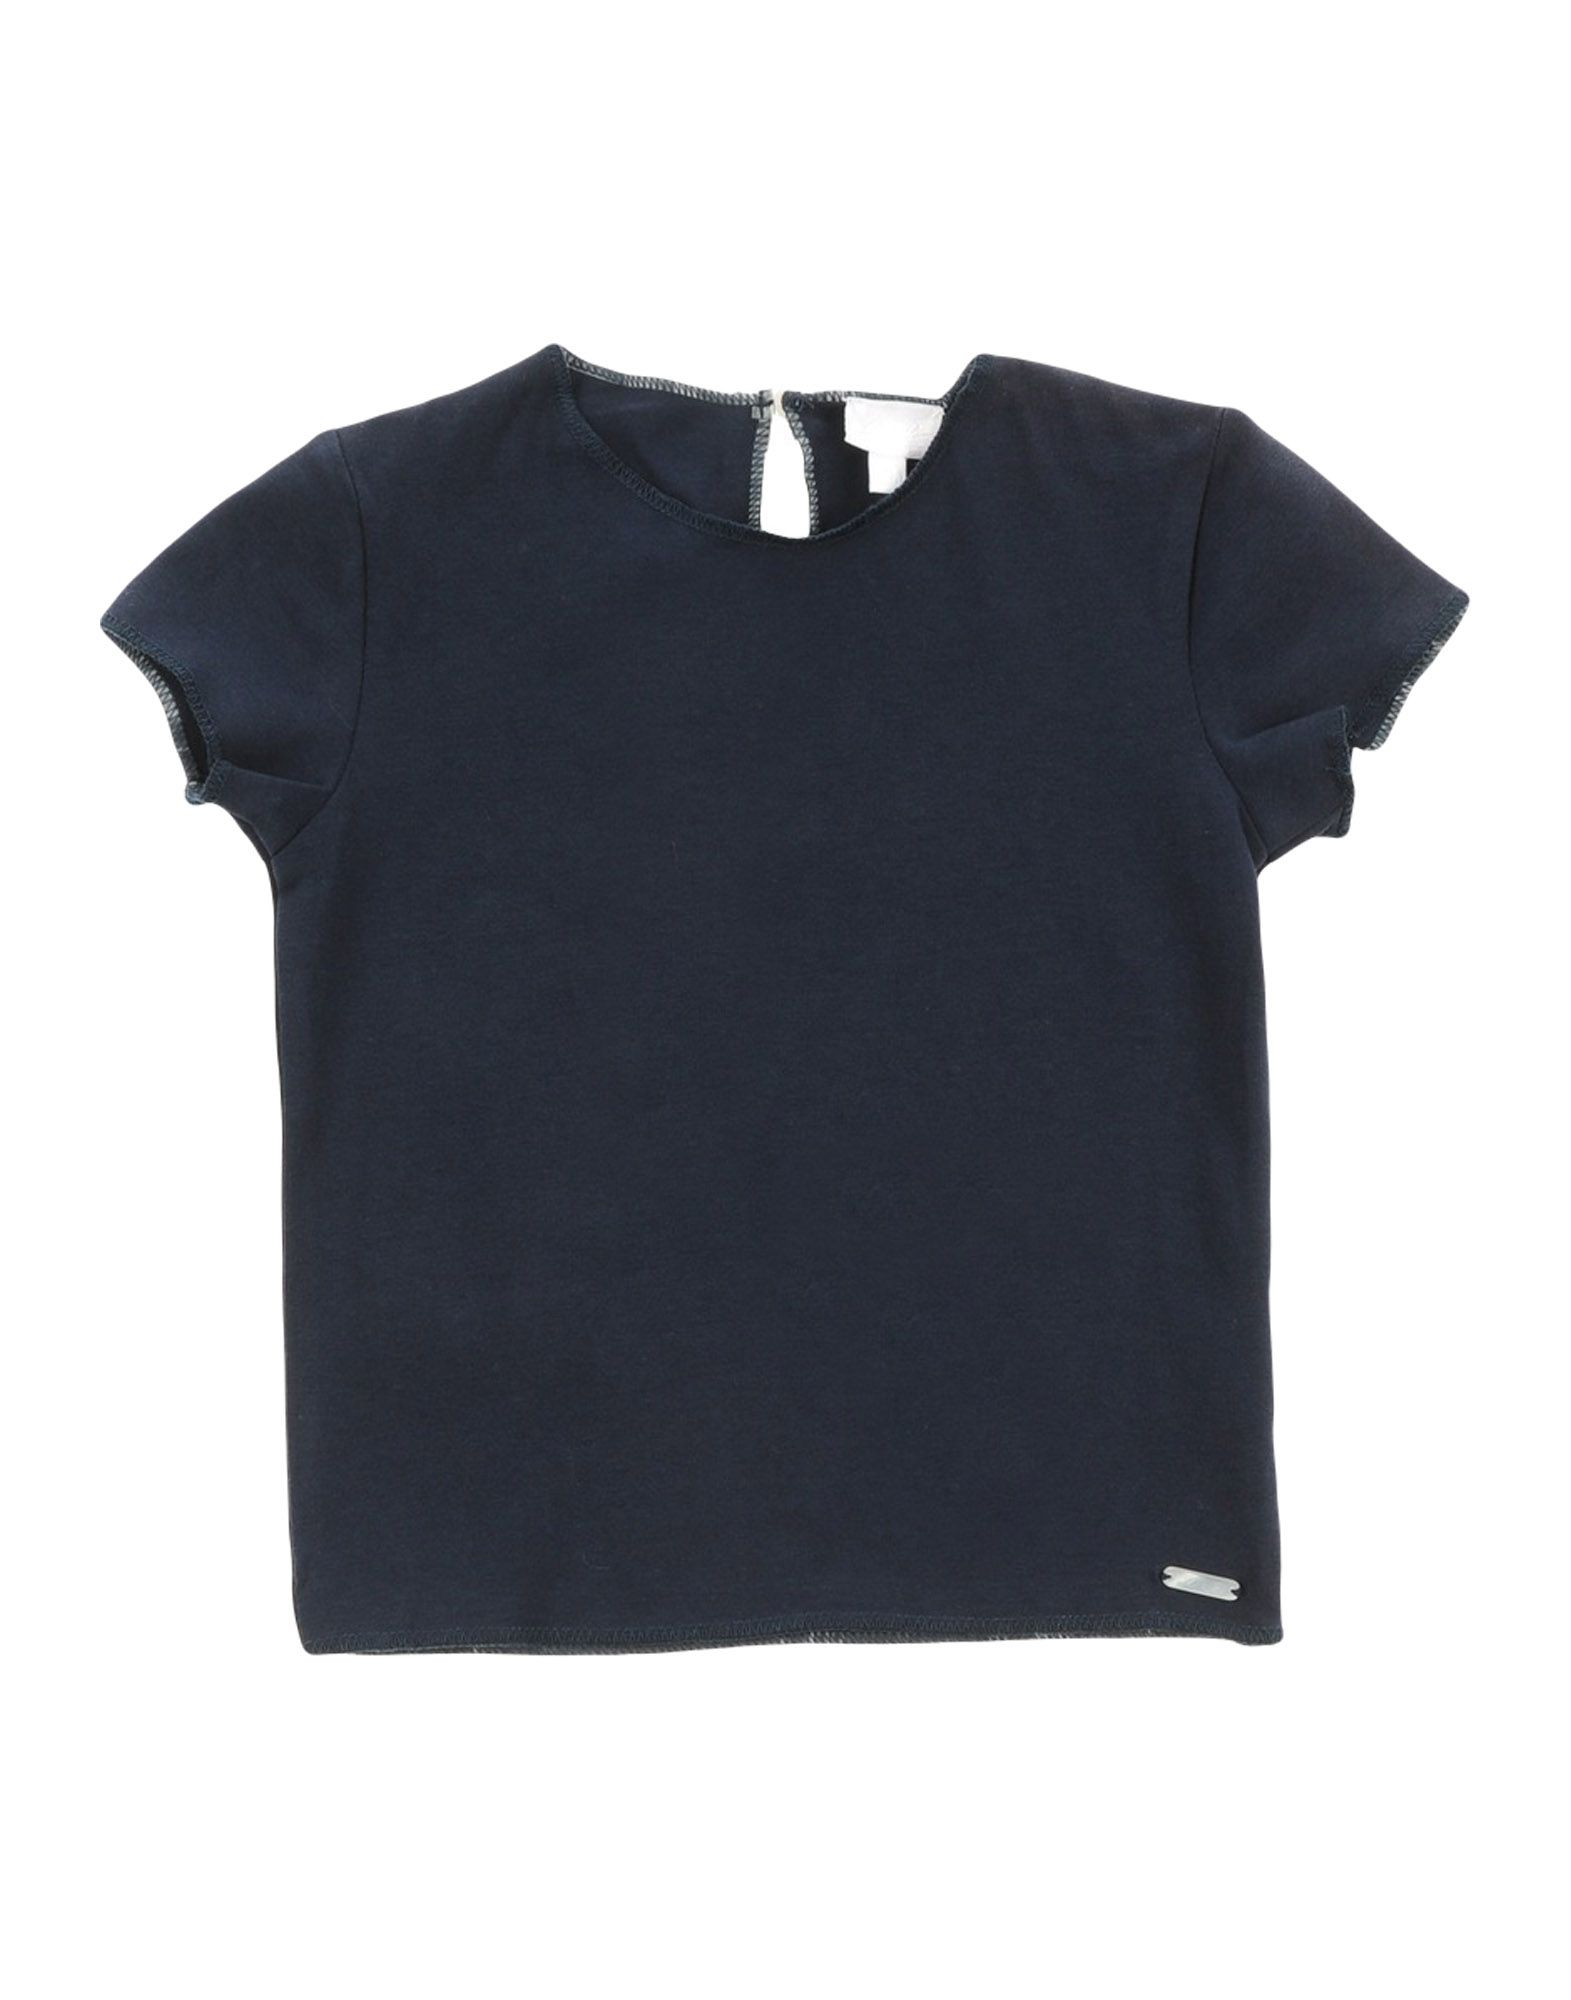 U+É Mädchen 0-24 monate T-shirts Farbe Dunkelblau Größe 6